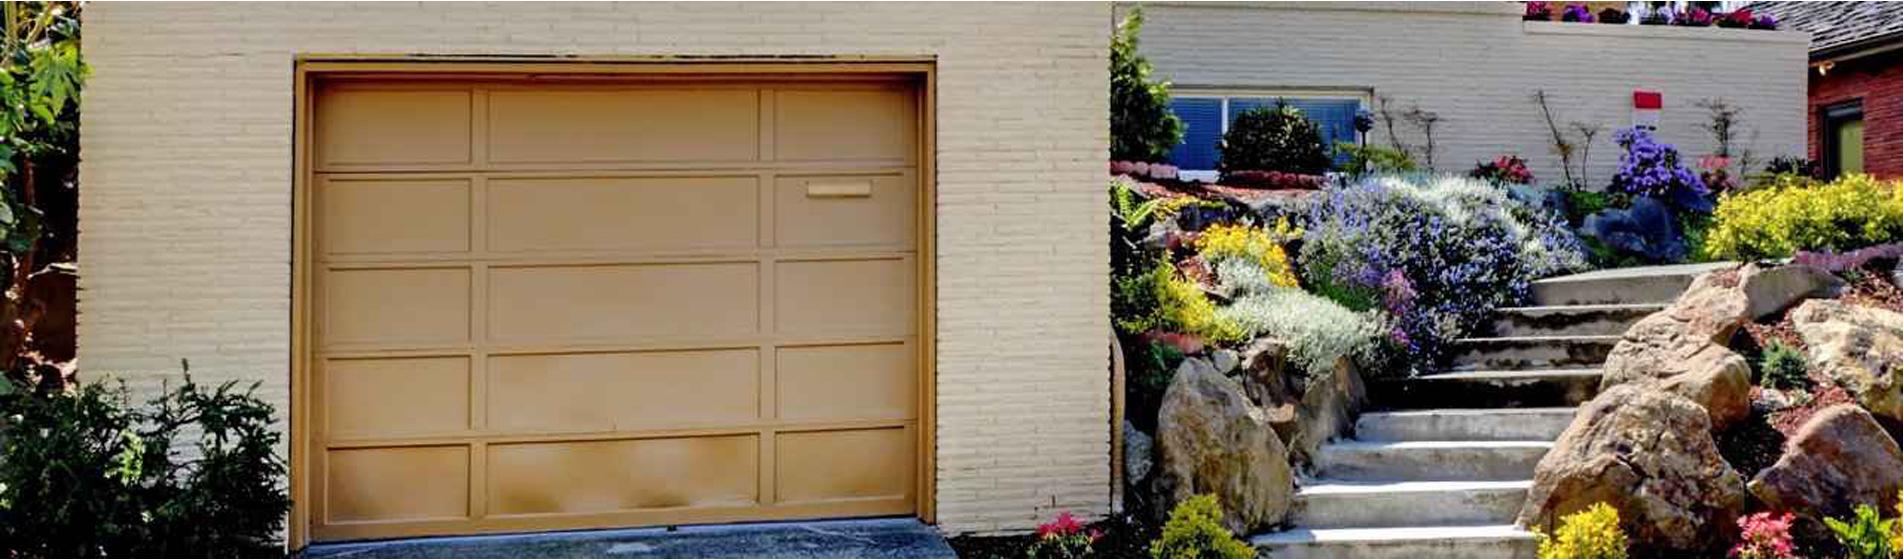 installer porte de garage alu 84300